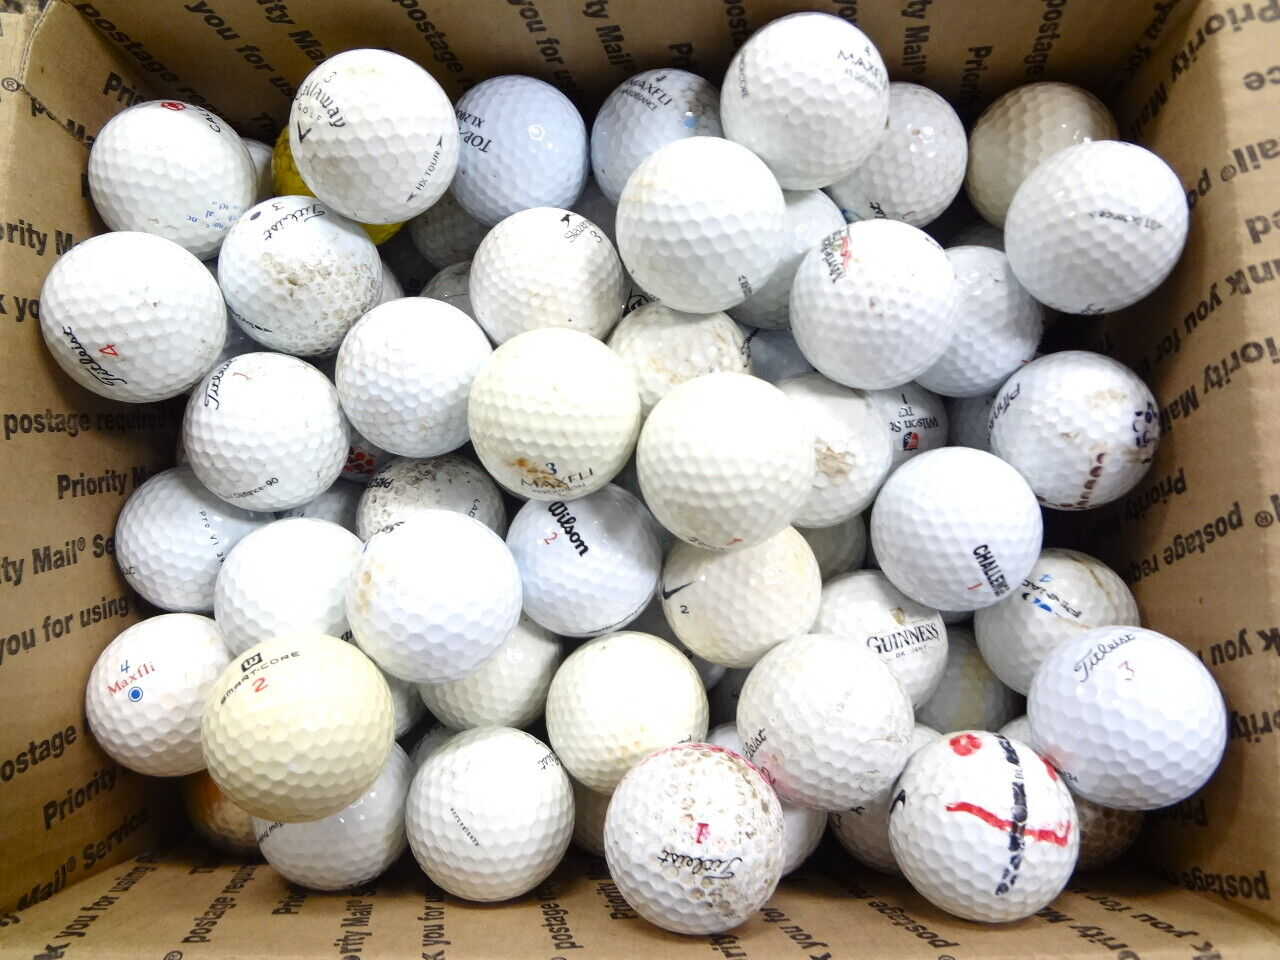 100 Miscellaneous Hit Away Practice Range Shag Golf Balls